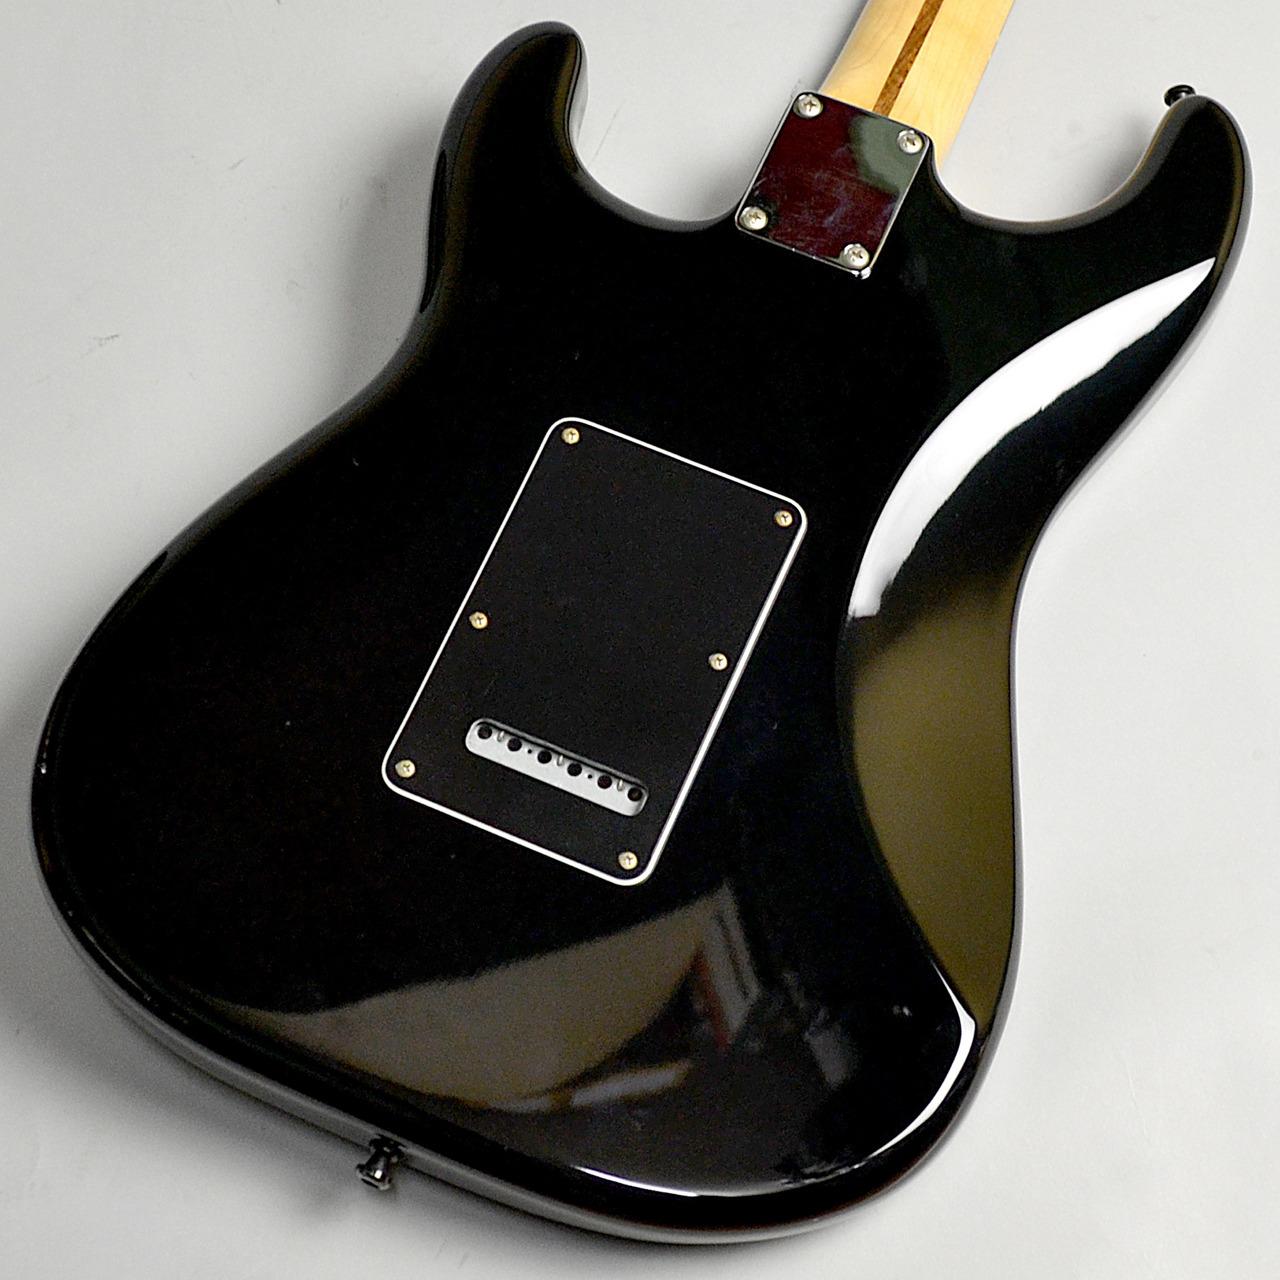 Blacktop Stratocaster HHのボディバック-アップ画像